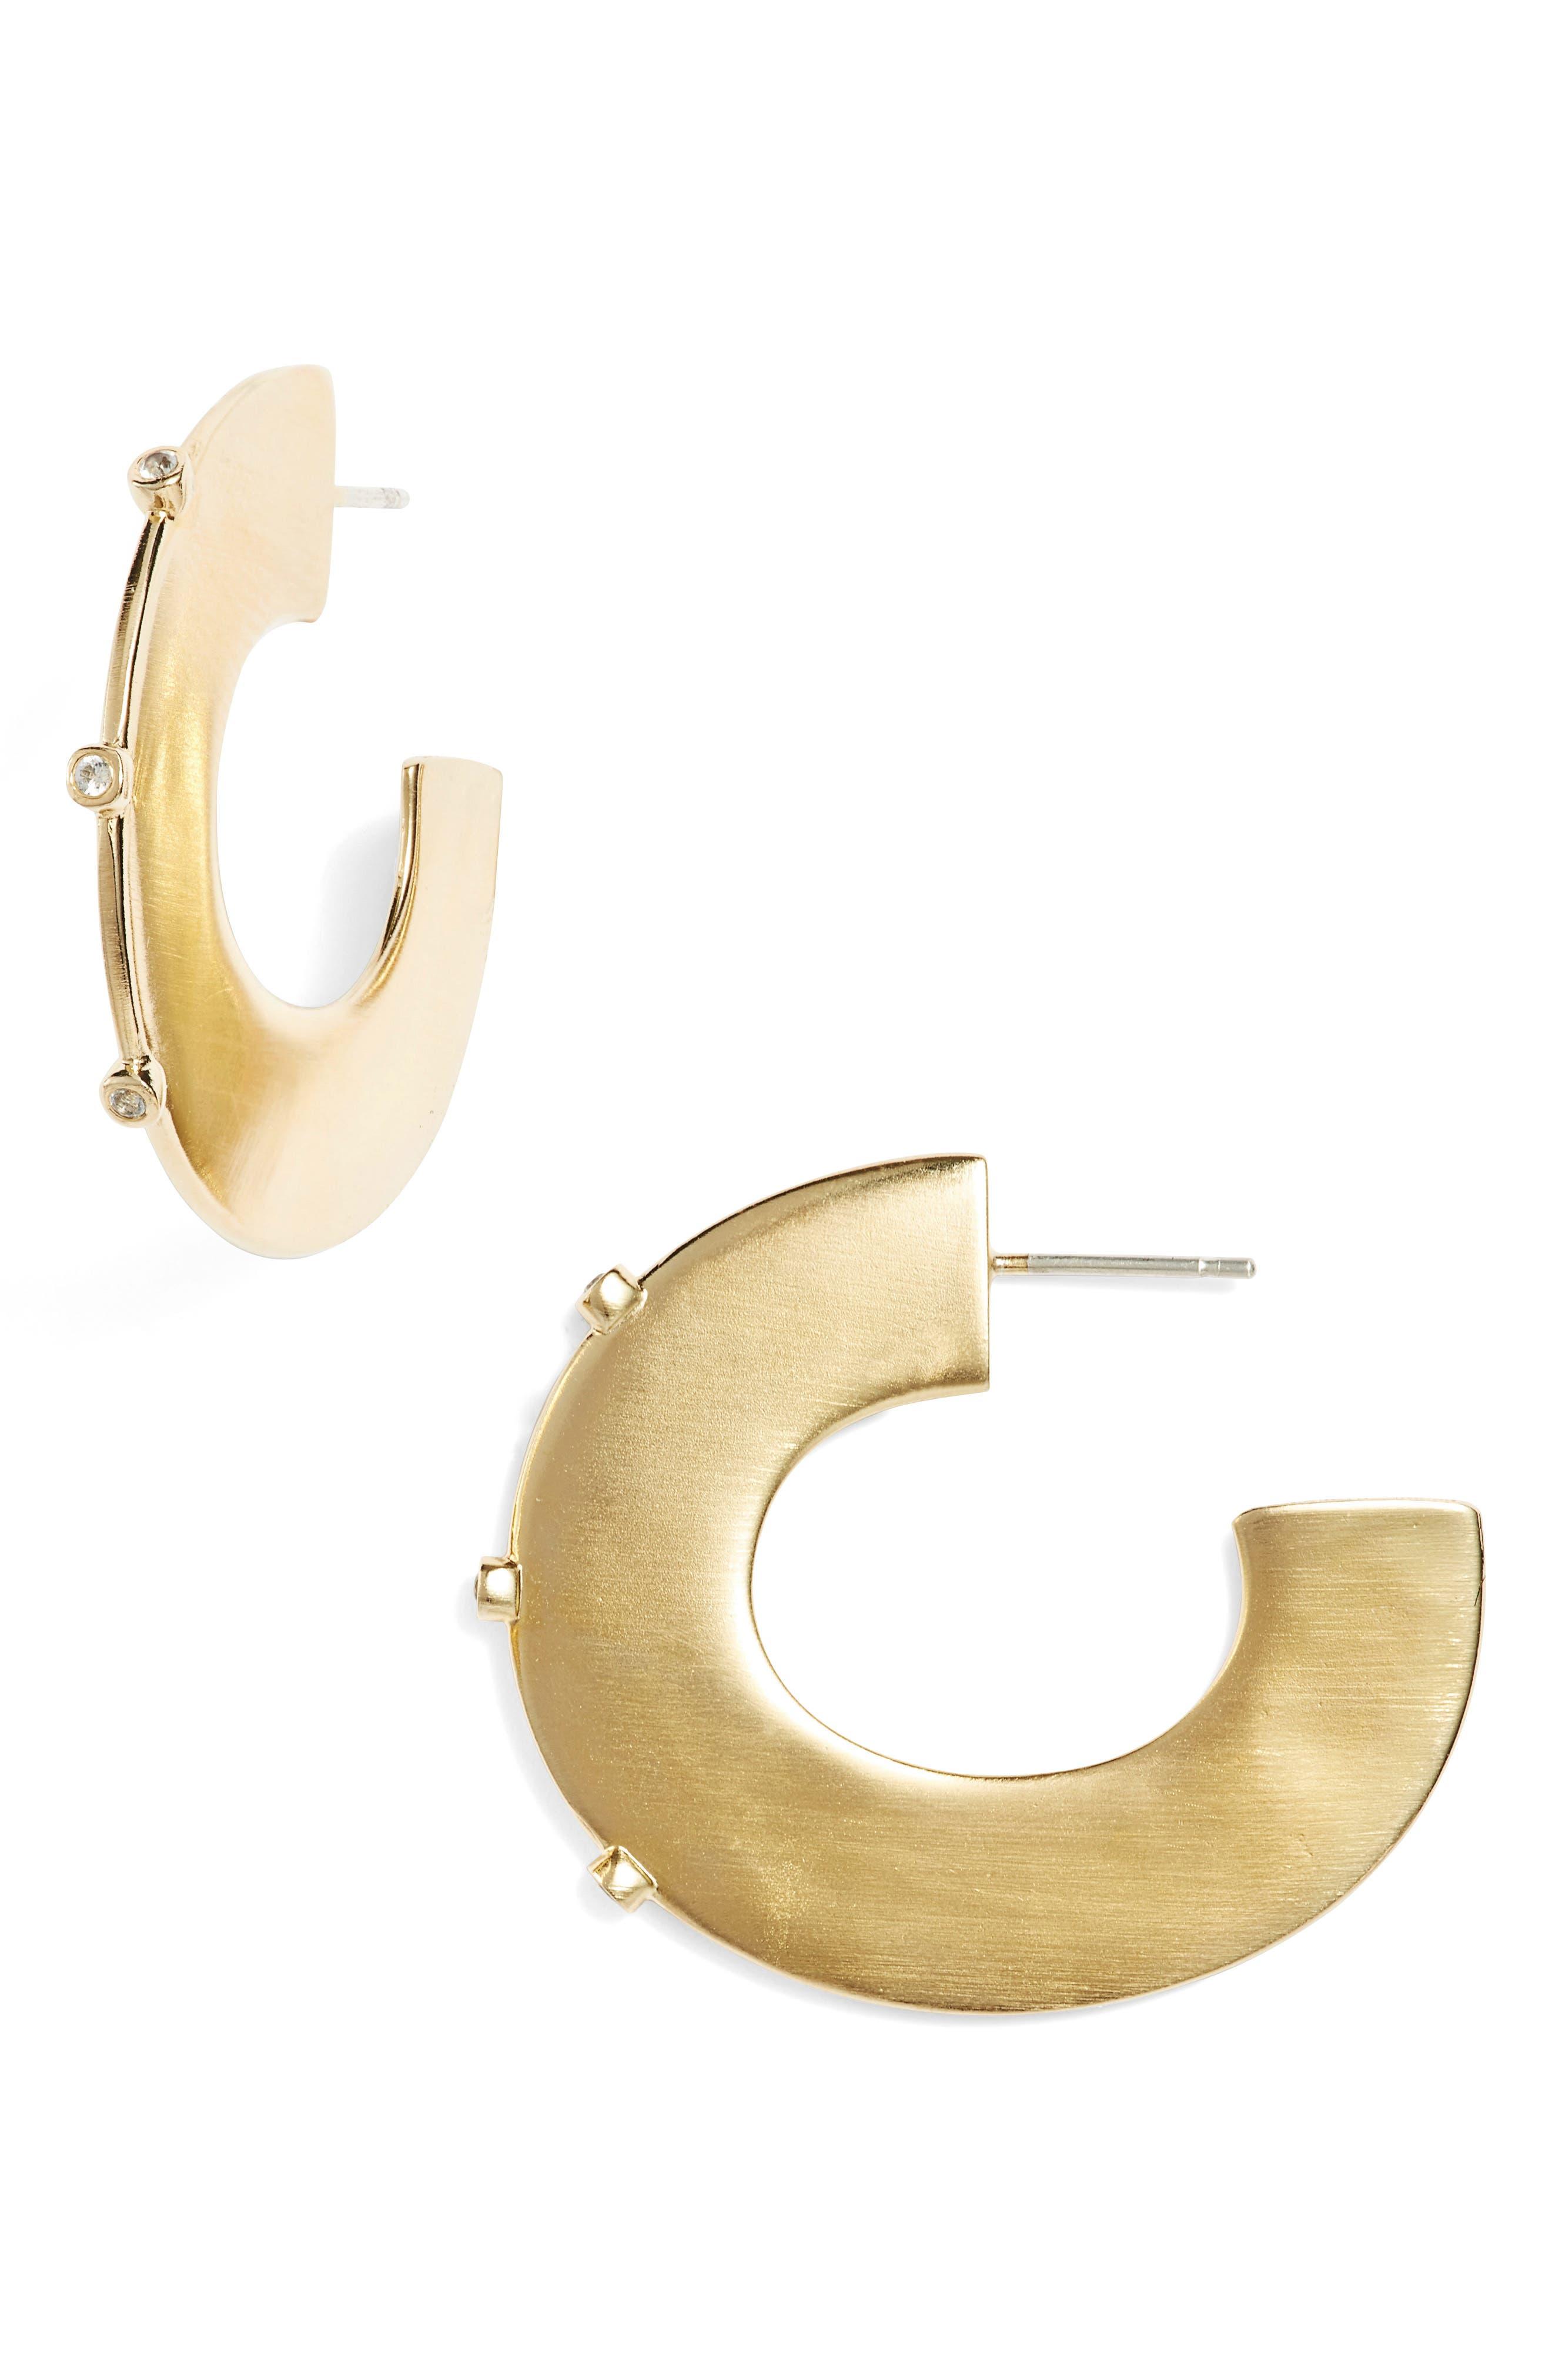 Sullivan - Joni White Topaz Hoop Earrings,                             Main thumbnail 1, color,                             Yellow Gold